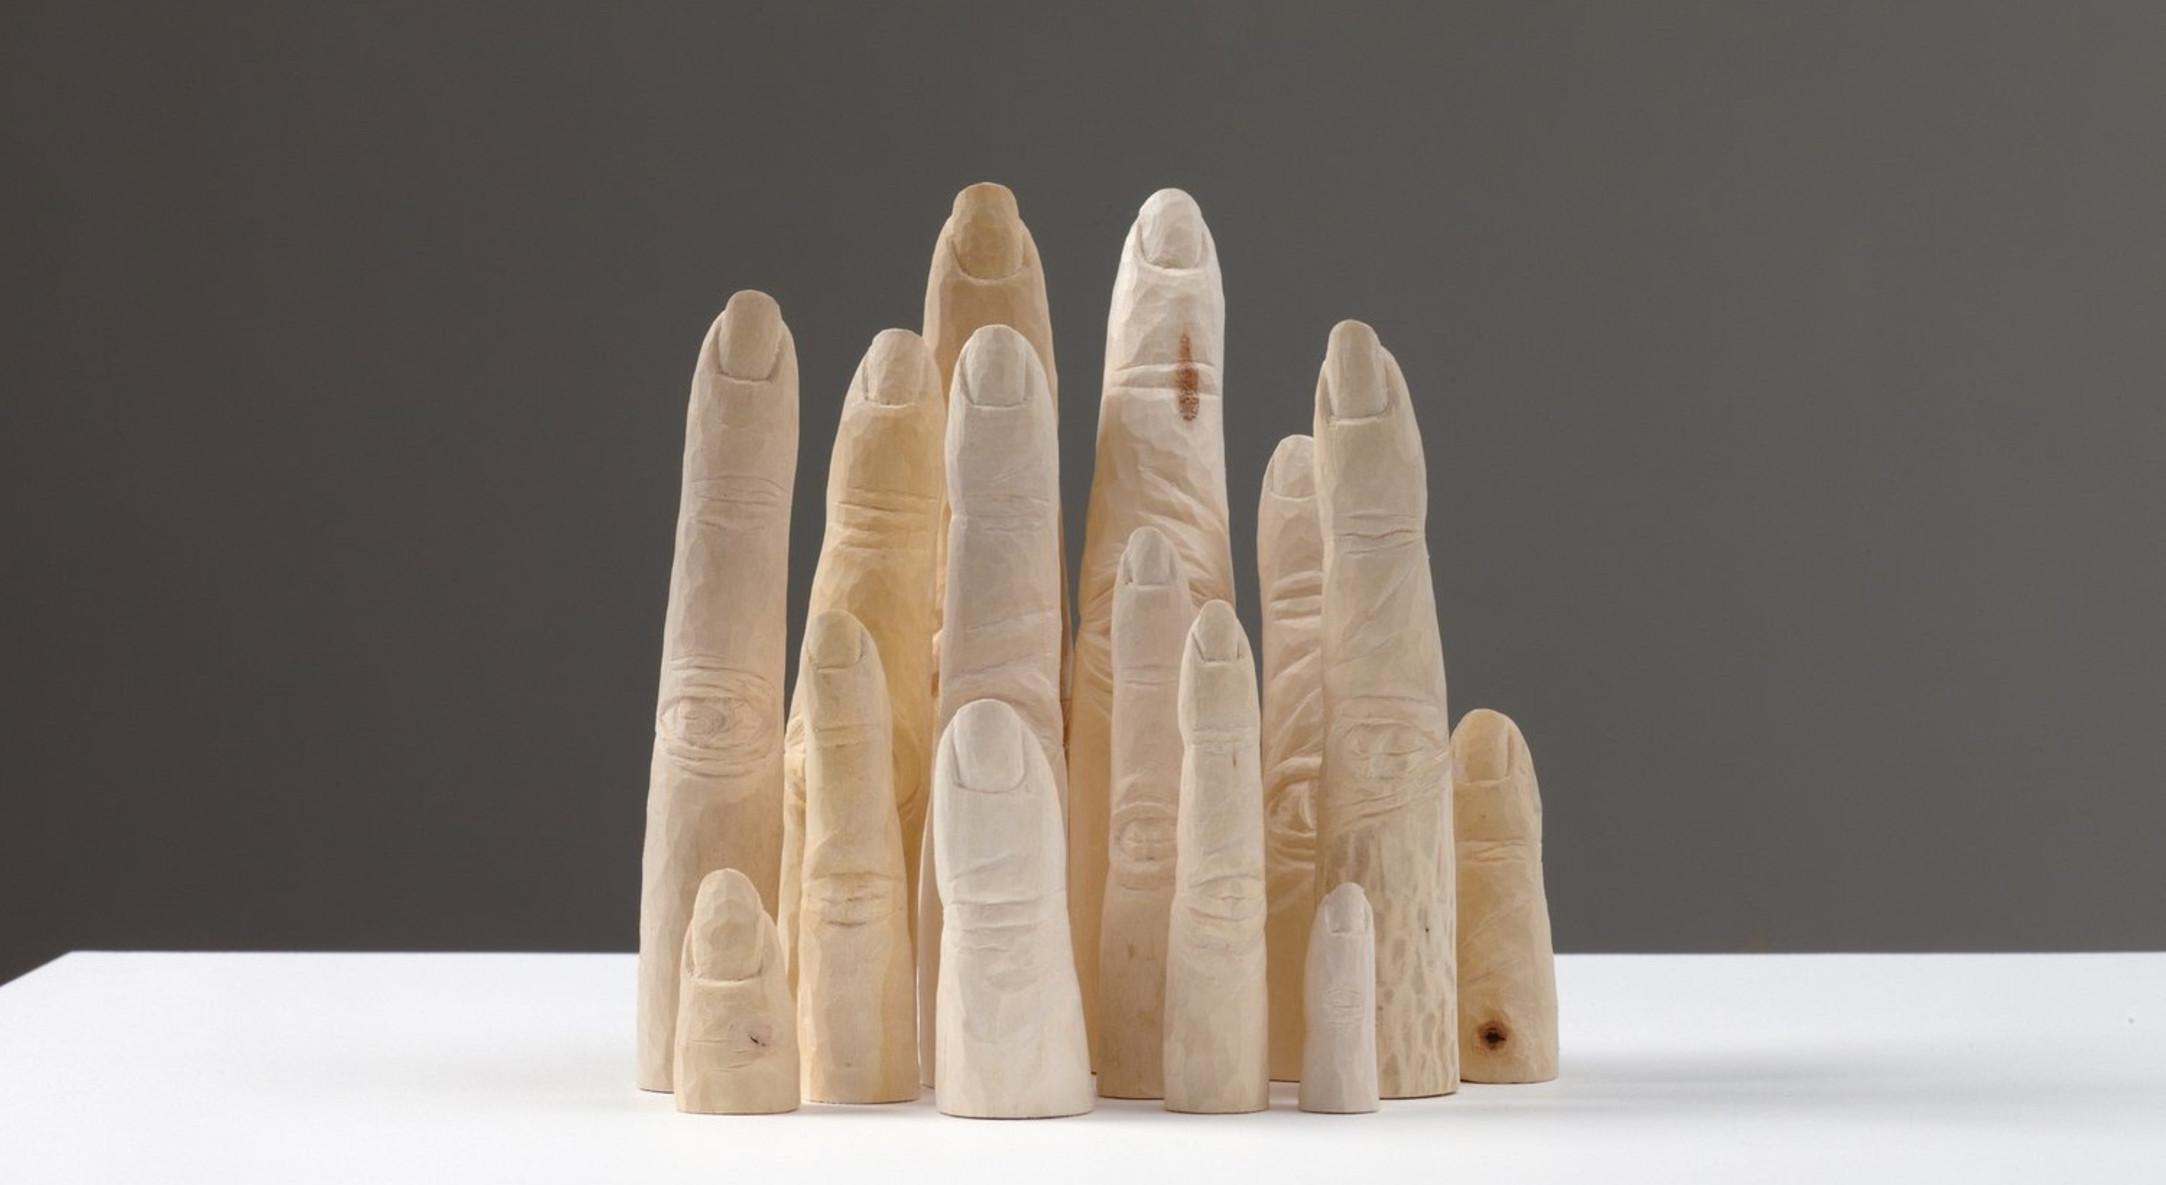 Jane Wilbraham, Index, 2010-2011, Sycamore, 17 x 13 x 10 cm, 6 3/4 x 5 1/8 x 4 in